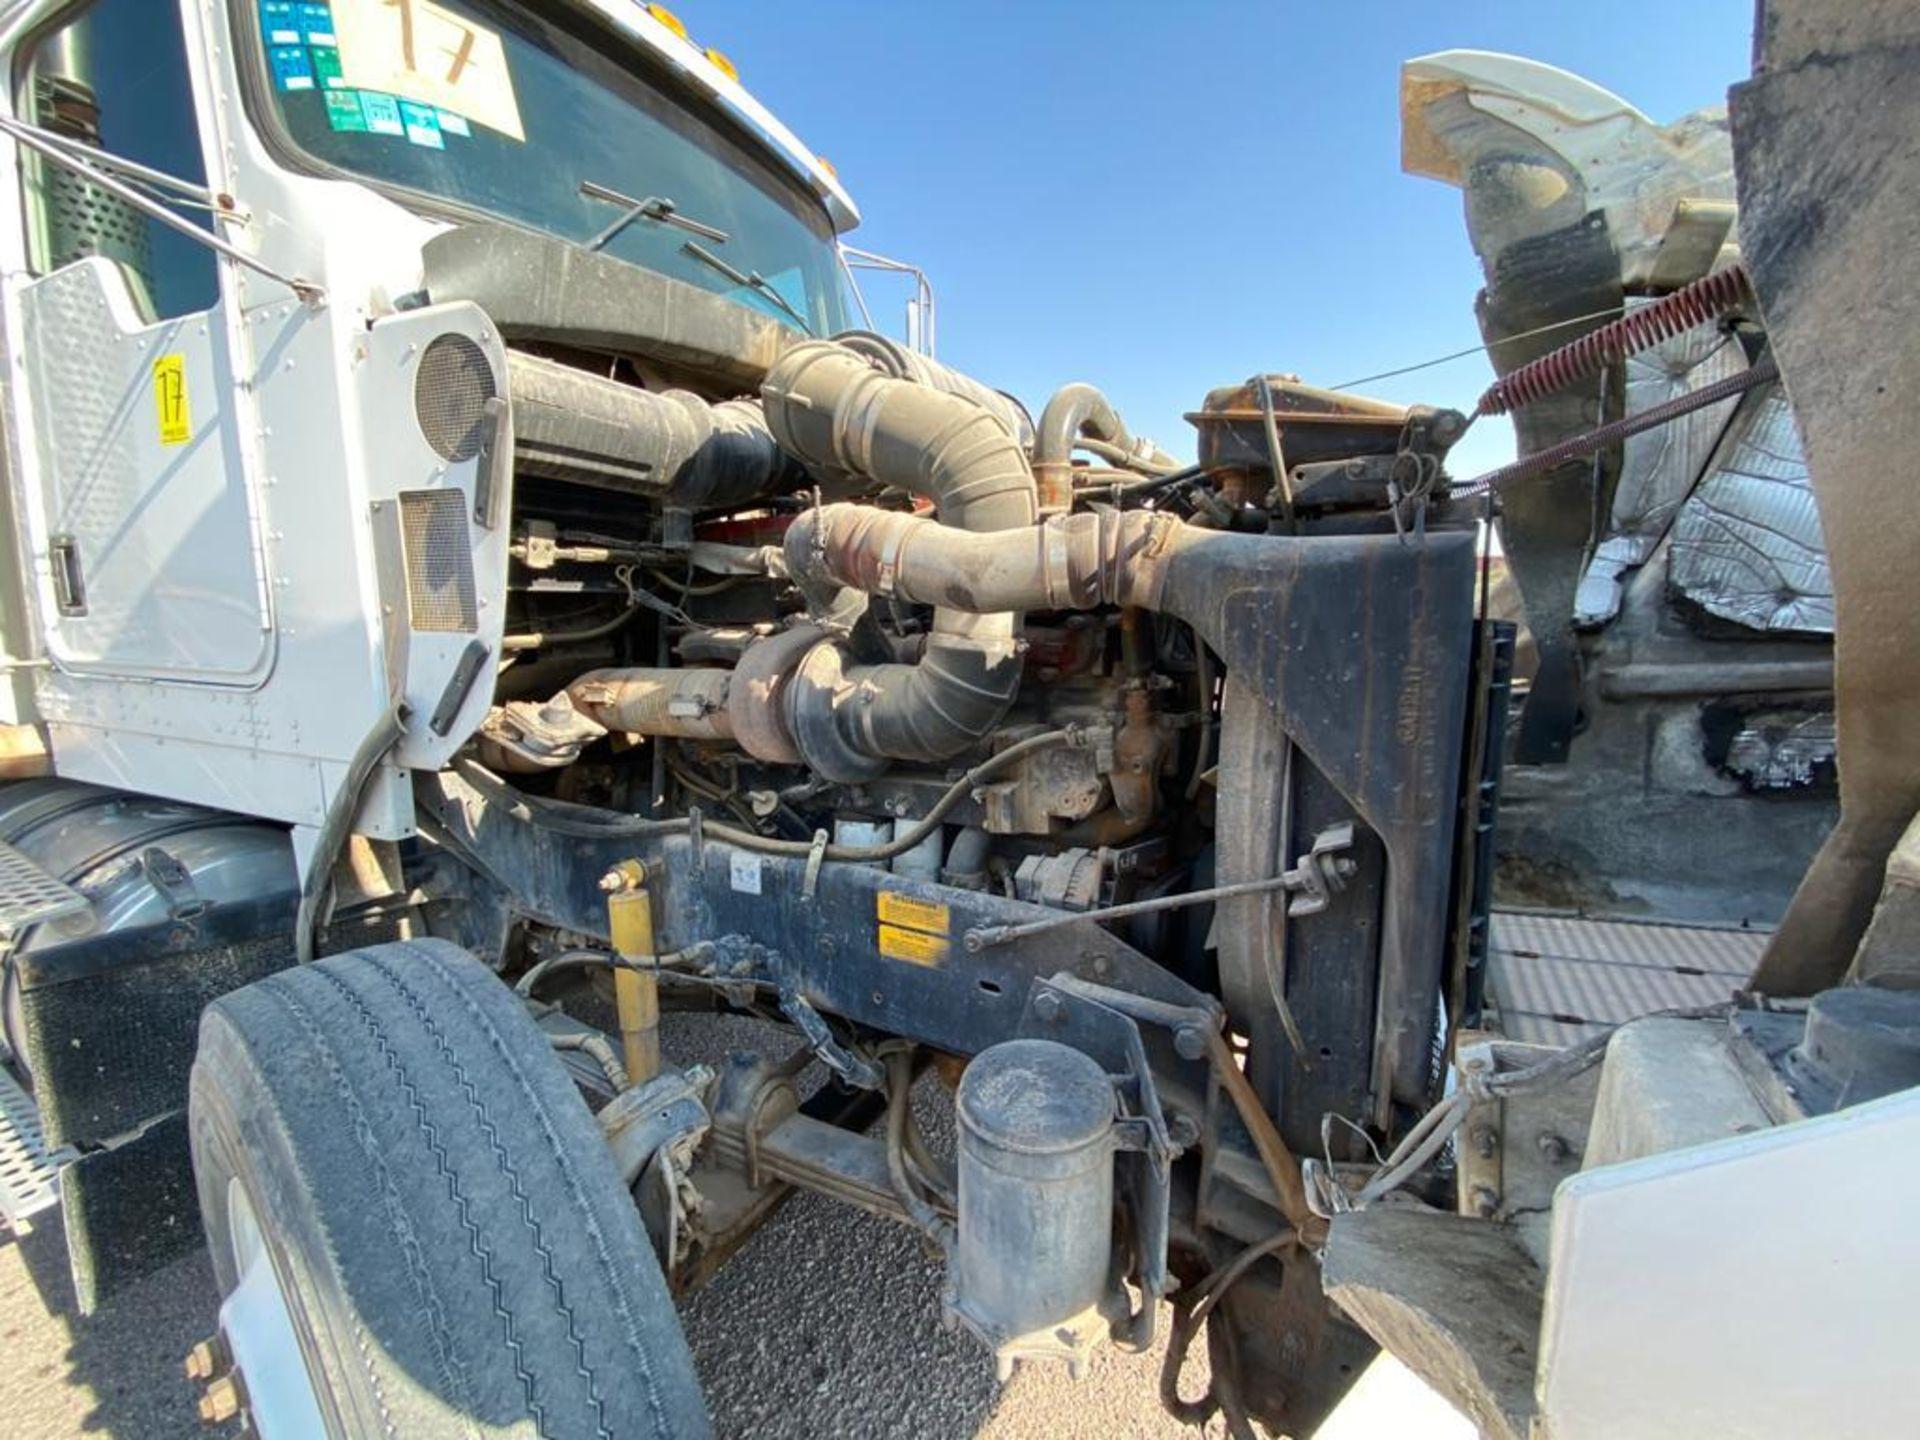 1998 Kenworth Sleeper Truck Tractor, standard transmission of 18 speeds - Image 52 of 55